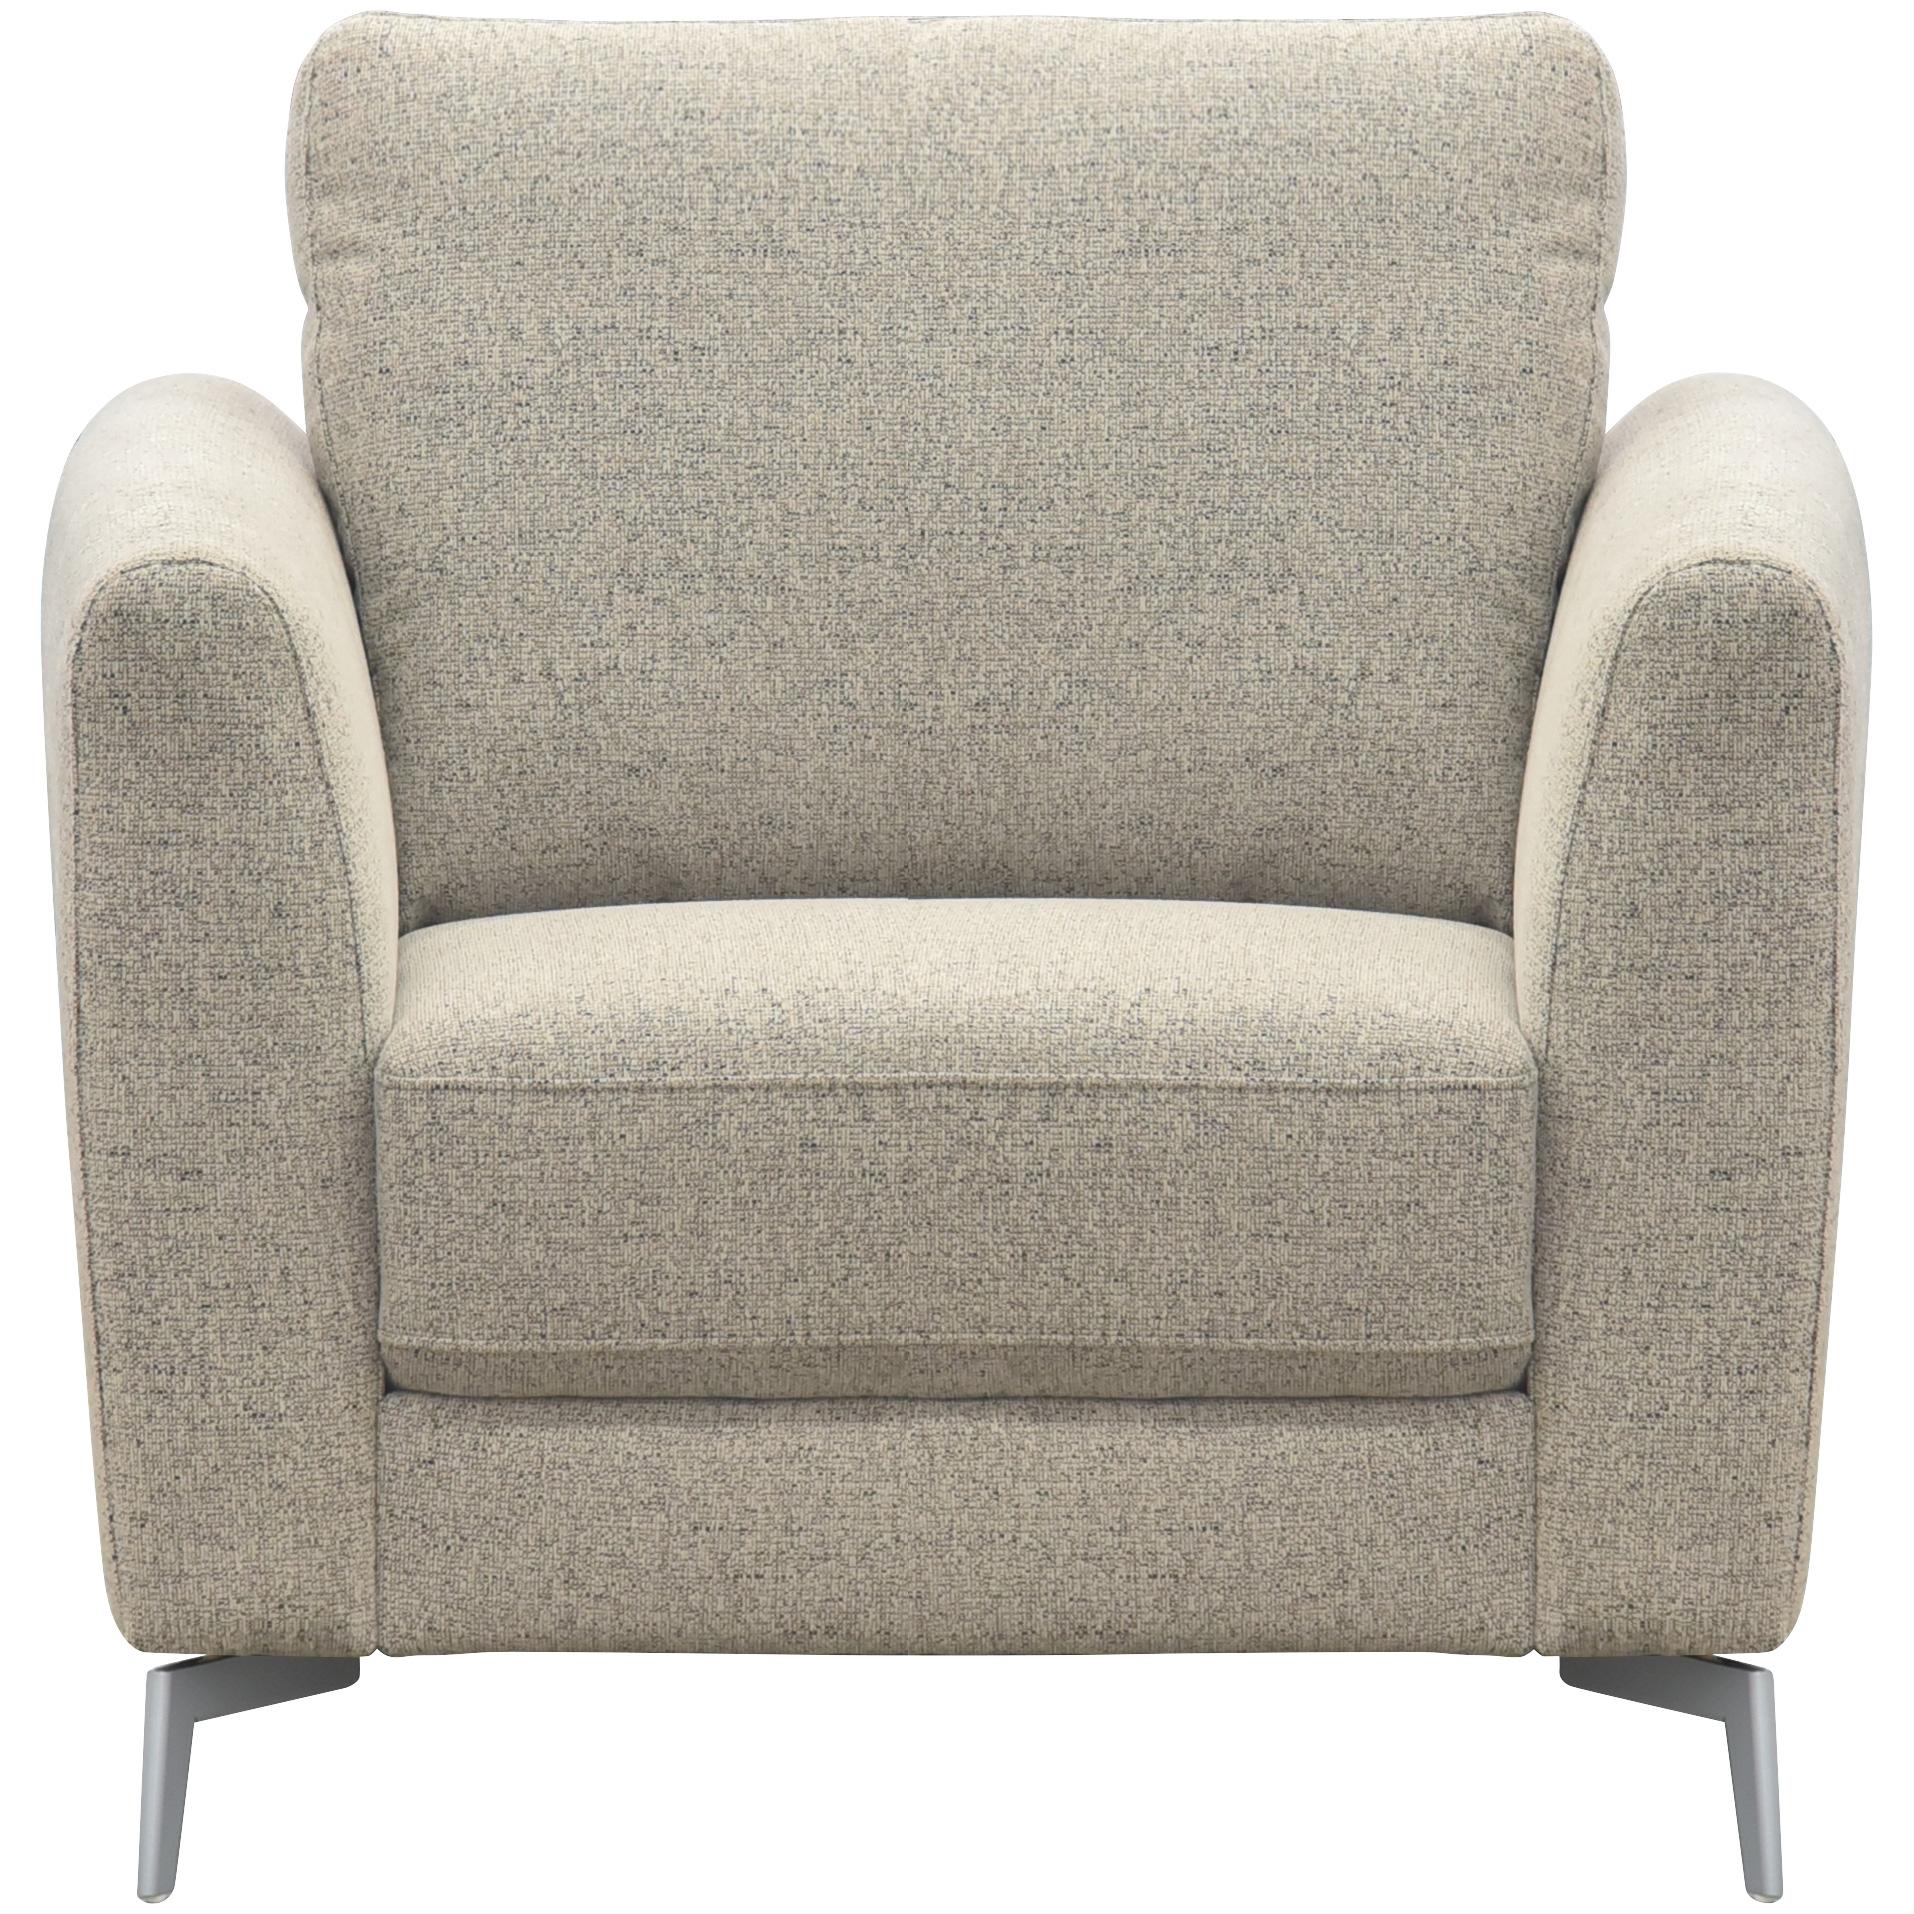 Terrace Living | Stockton White Chair